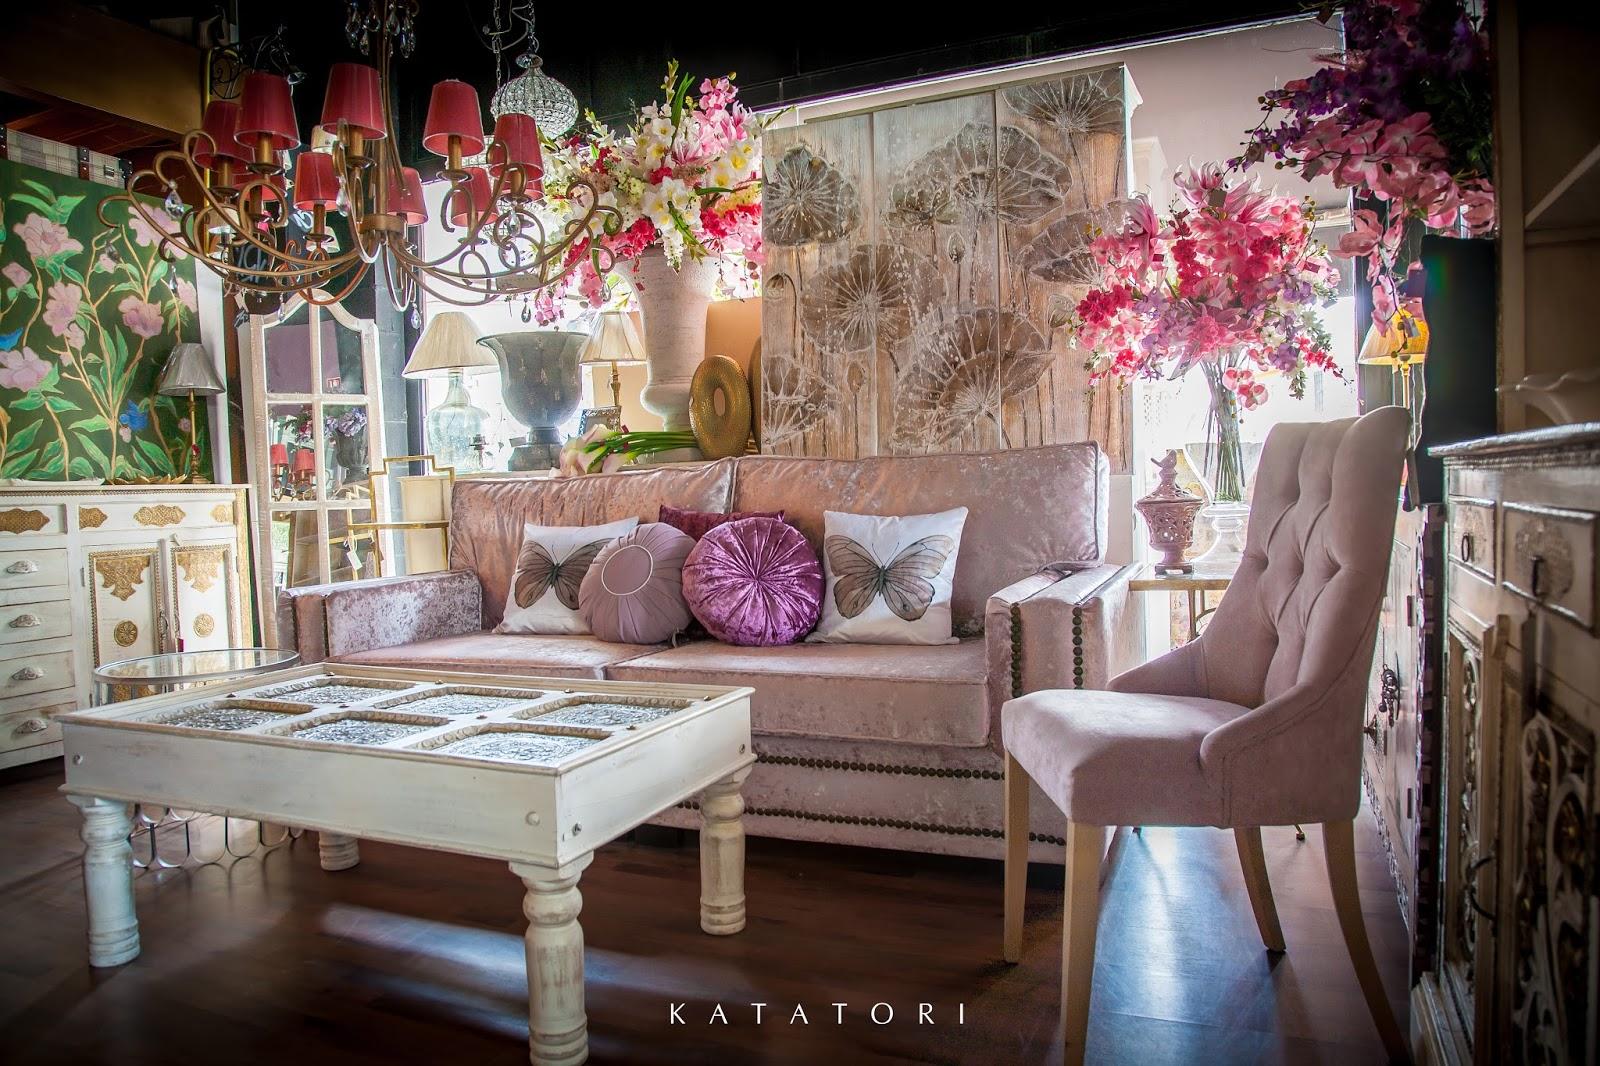 Katatori interiores fotograf as de marcos vega - Diseno interiores sevilla ...